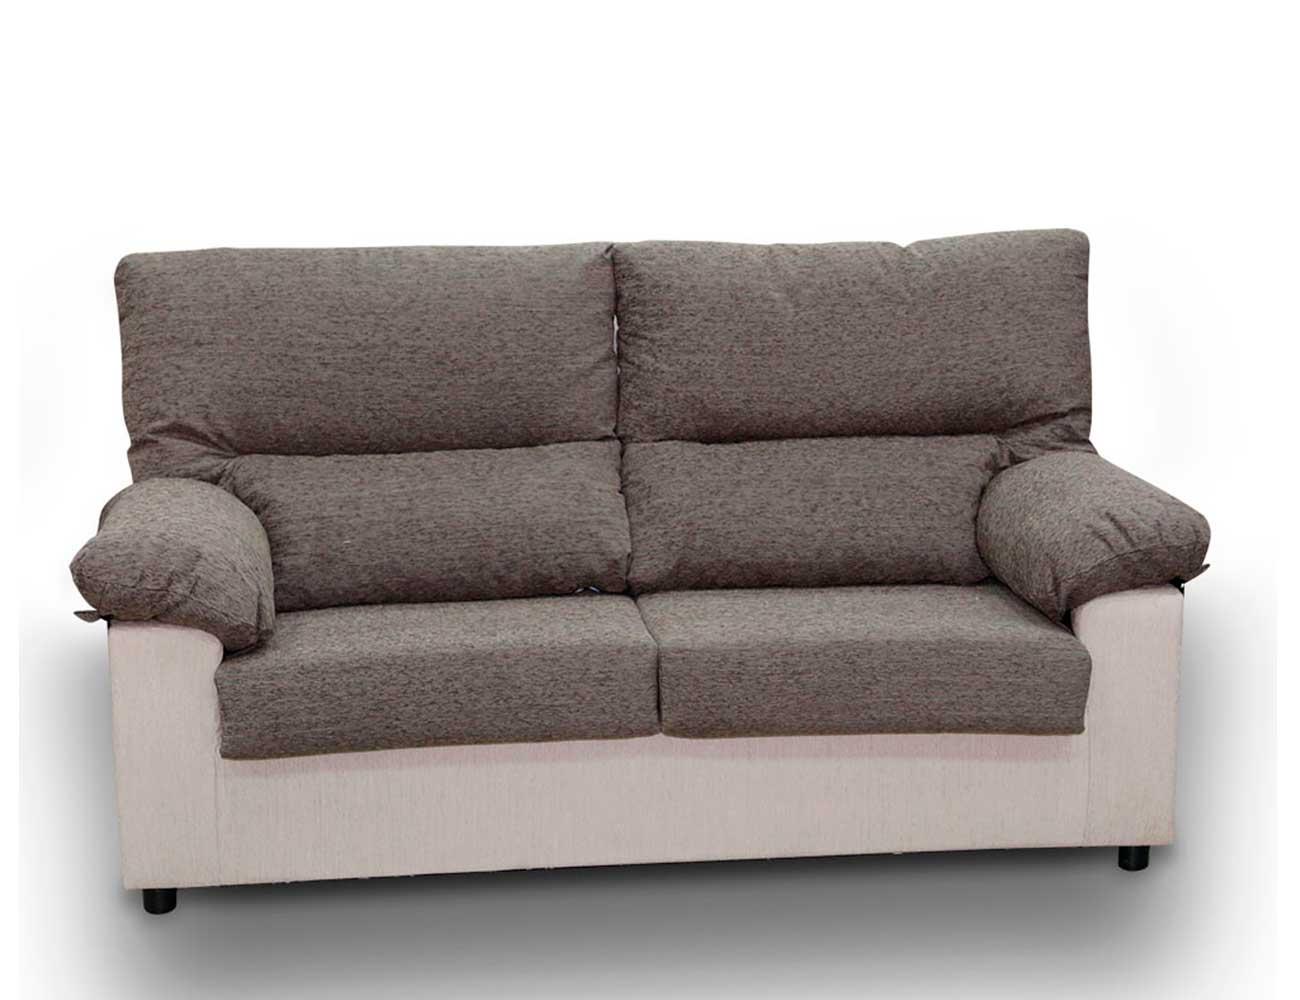 Sofa 3 plazas barato17